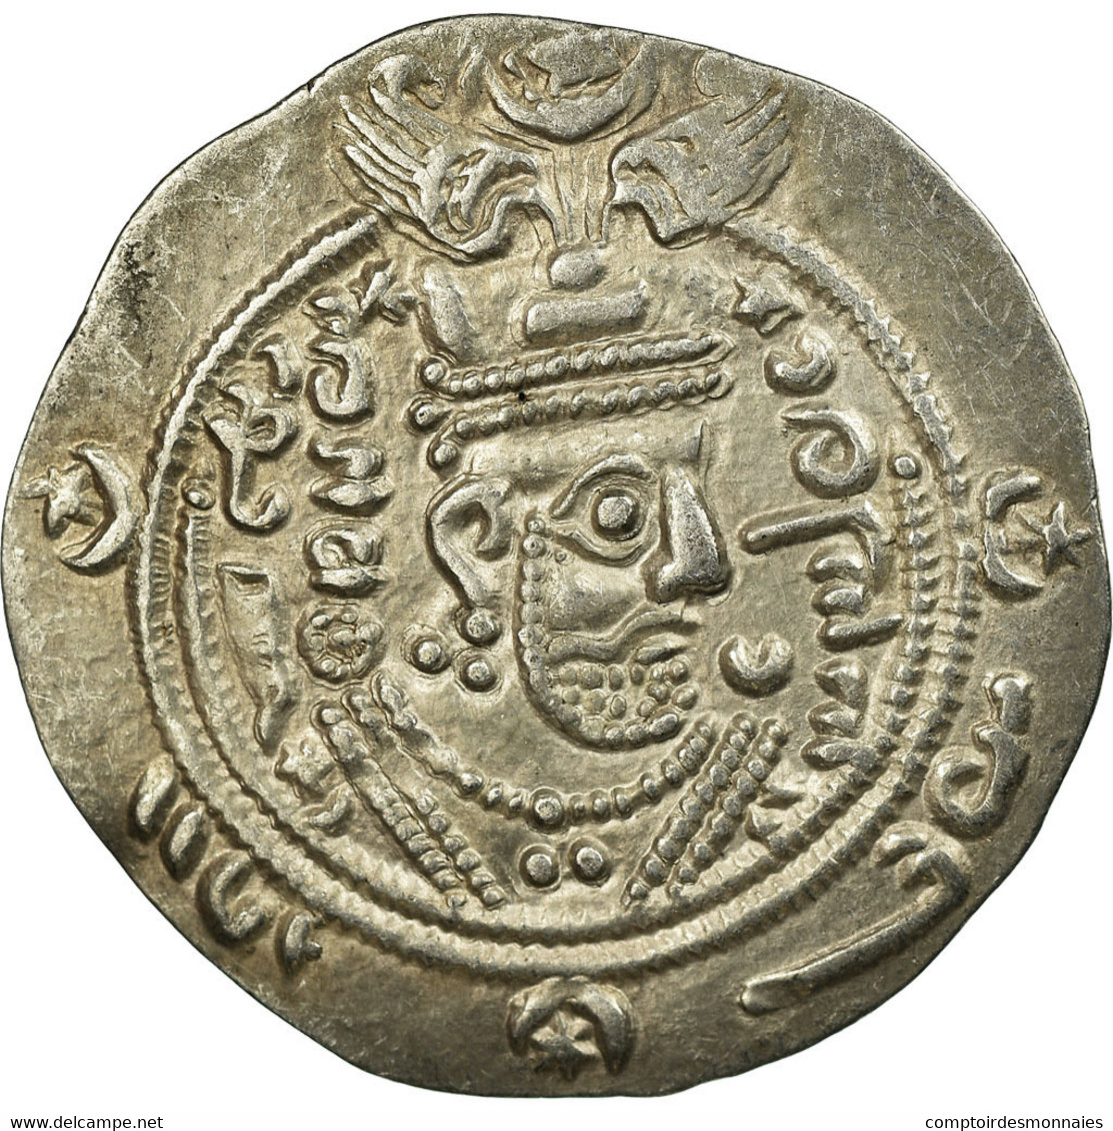 Monnaie, Tabaristan, Dabwayhid Ispahbads, Farkhan, Hémidrachme, PYE 75 (109 - Orientales